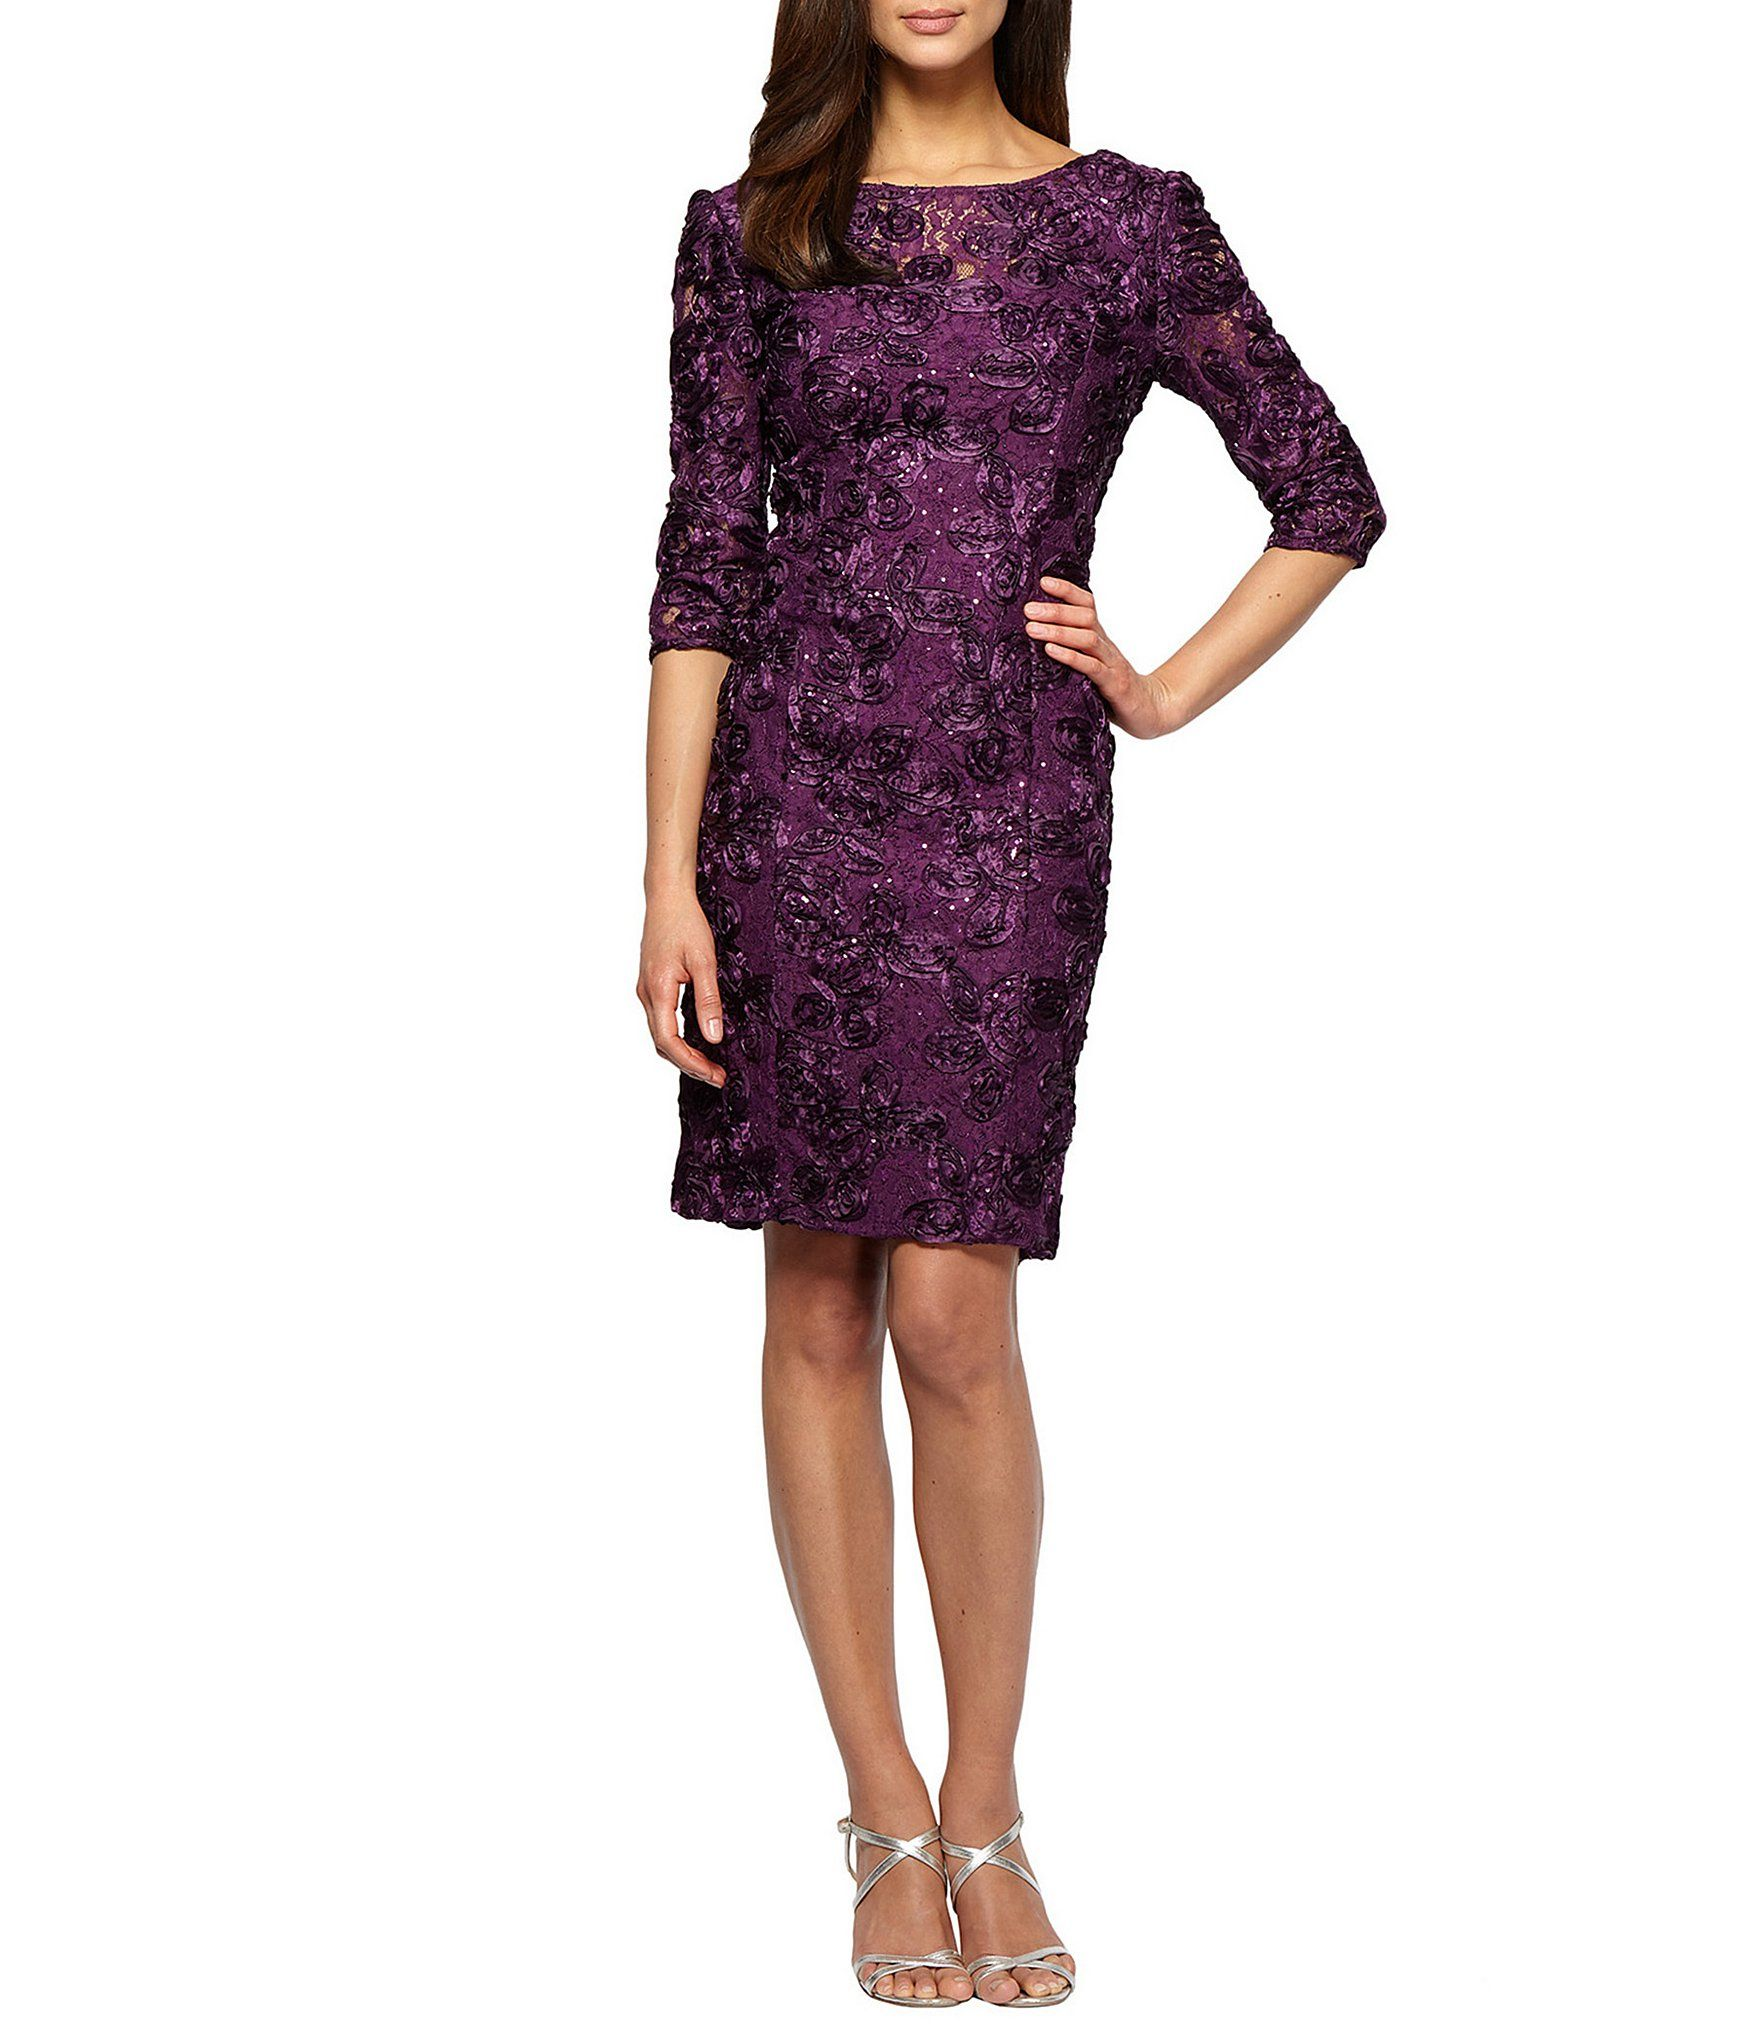 fd25b173ca9 Shop for Alex Evenings Rosette Sheath Dress at Dillards.com. Visit Dillards.com  to find clothing